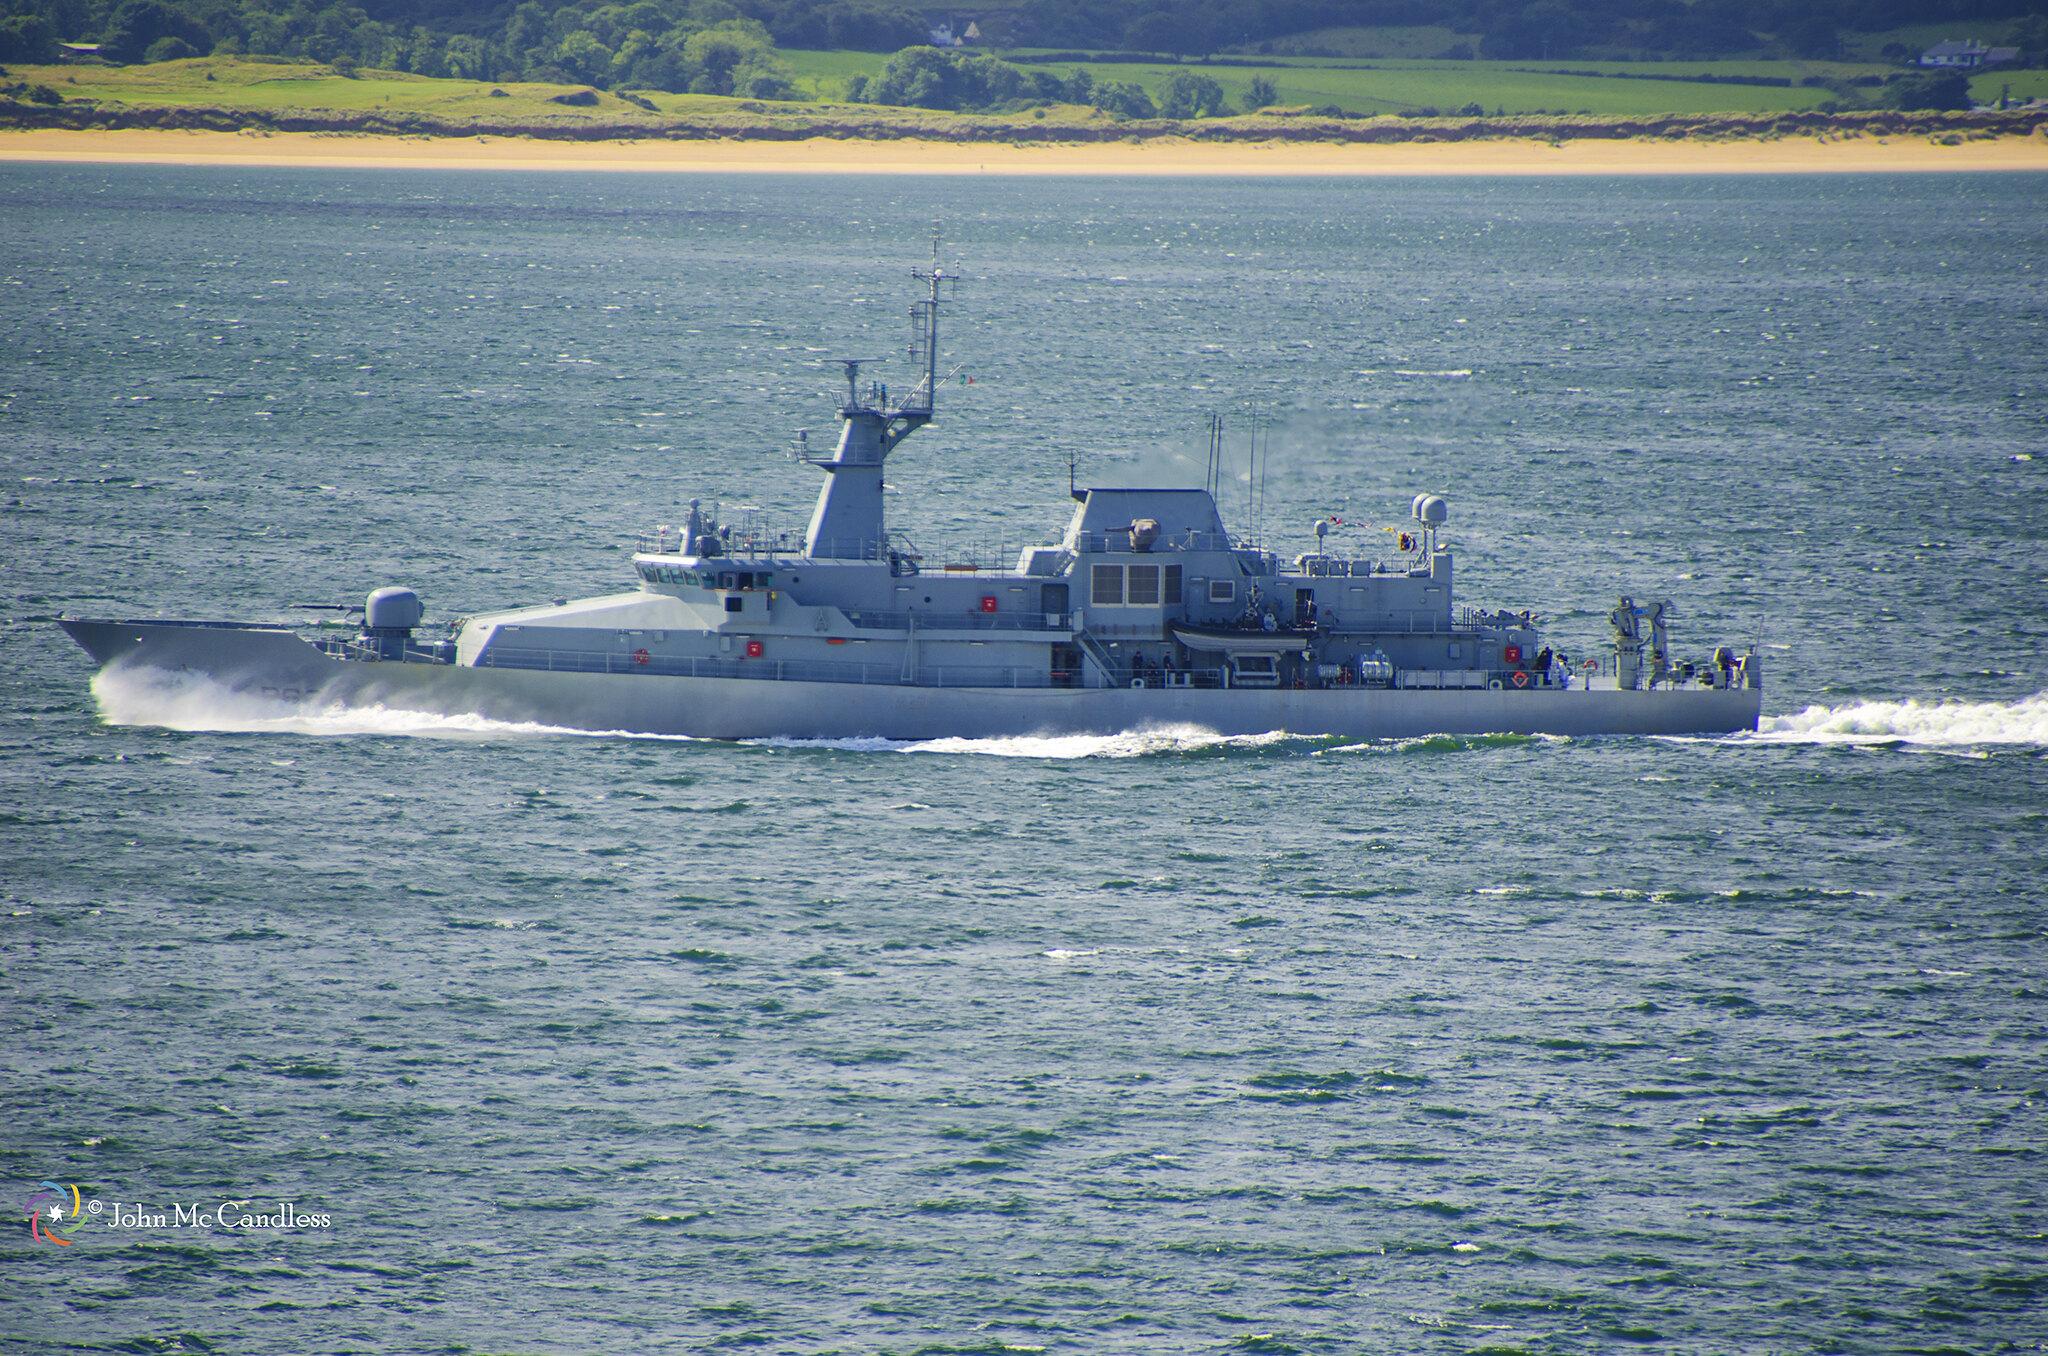 Irish Naval Service - Force Navale Irlandaise - Page 2 36407384215_b870f68d7c_k